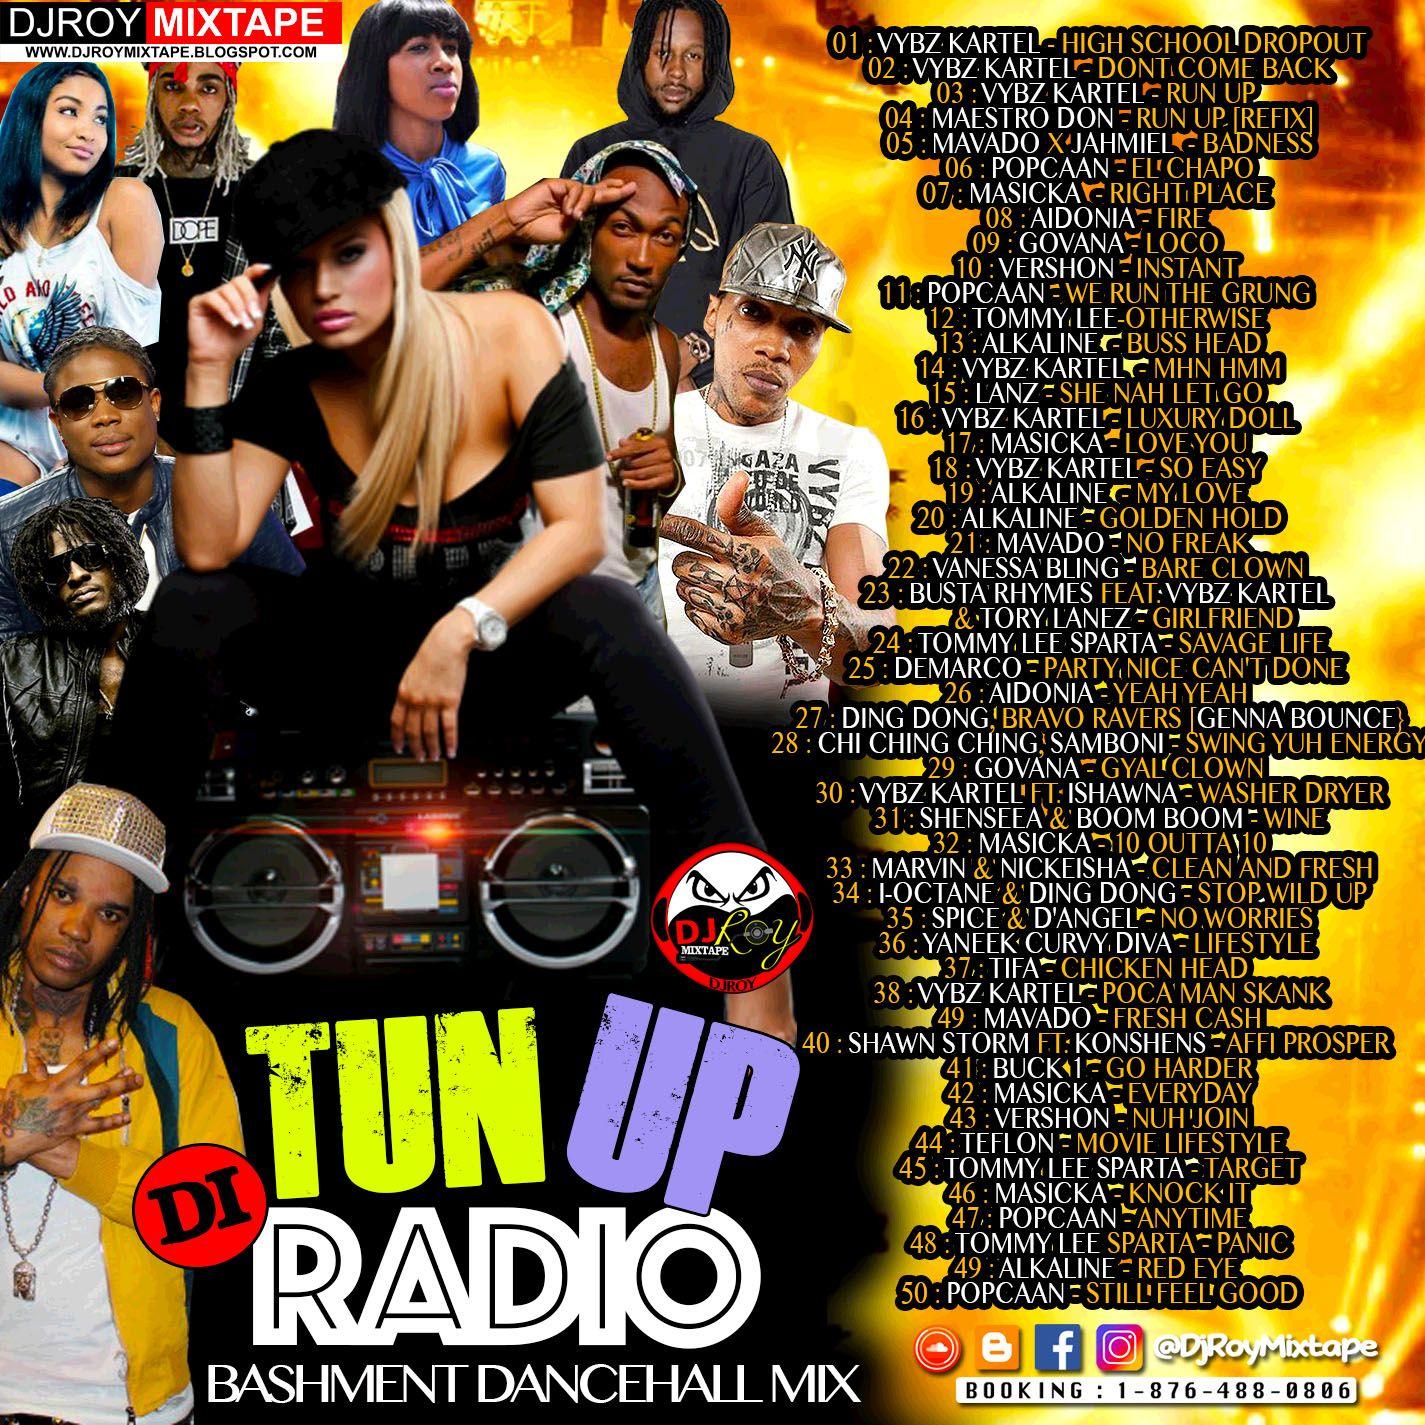 DJ ROY TUN UP DI RADIO BASHMENT DANCEHALL MIX 2017 by DJROYMIXTAPE